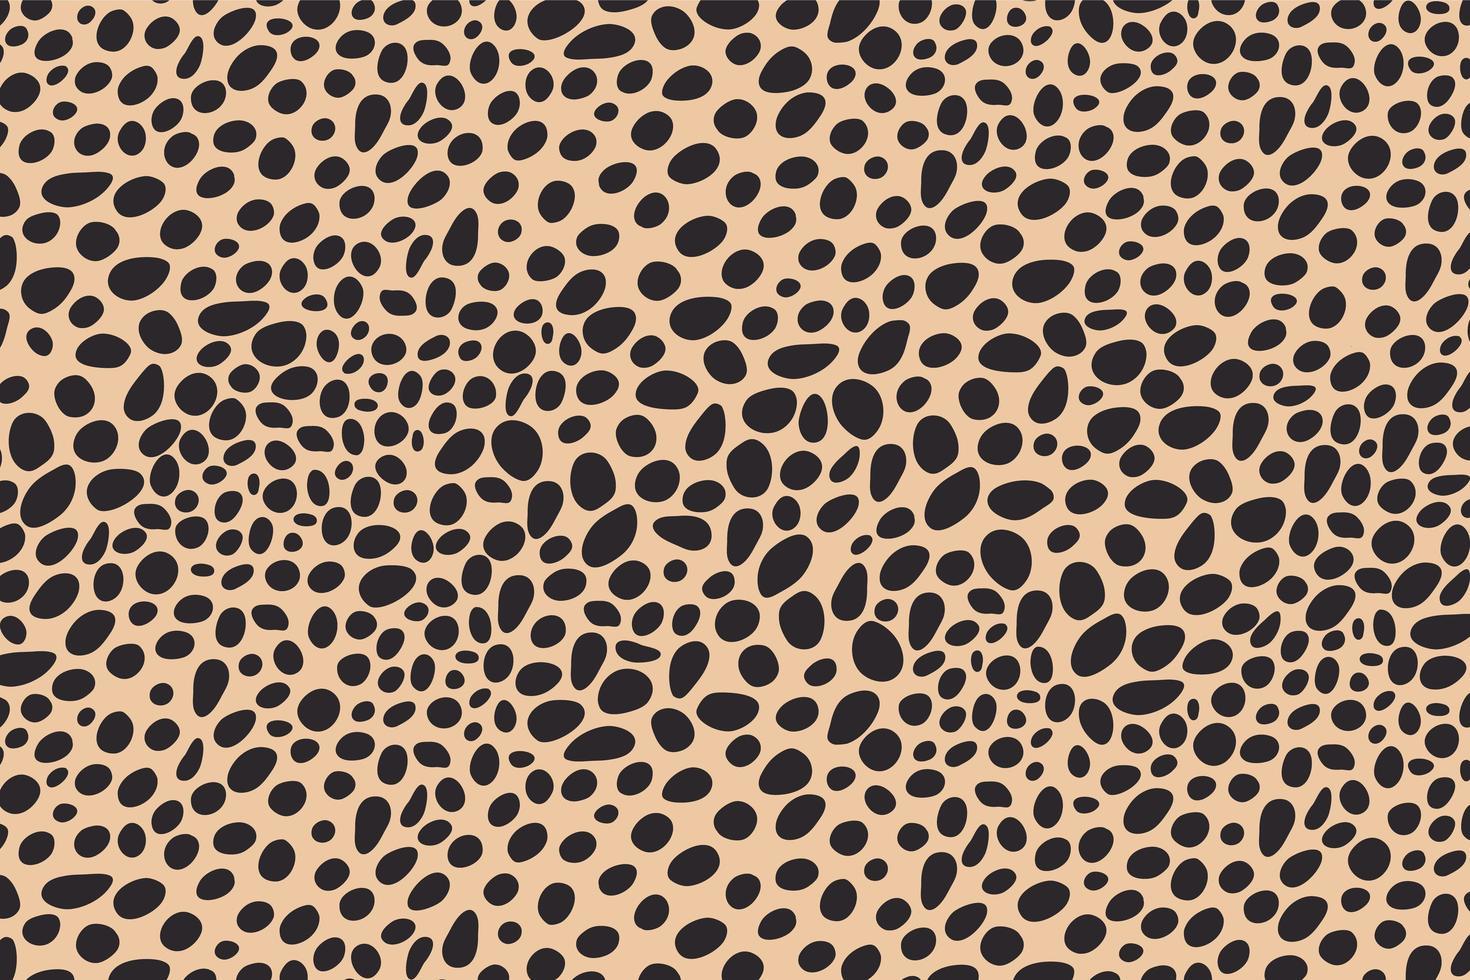 Abstract dots animal print design. Leopard print design. Cheetah ...